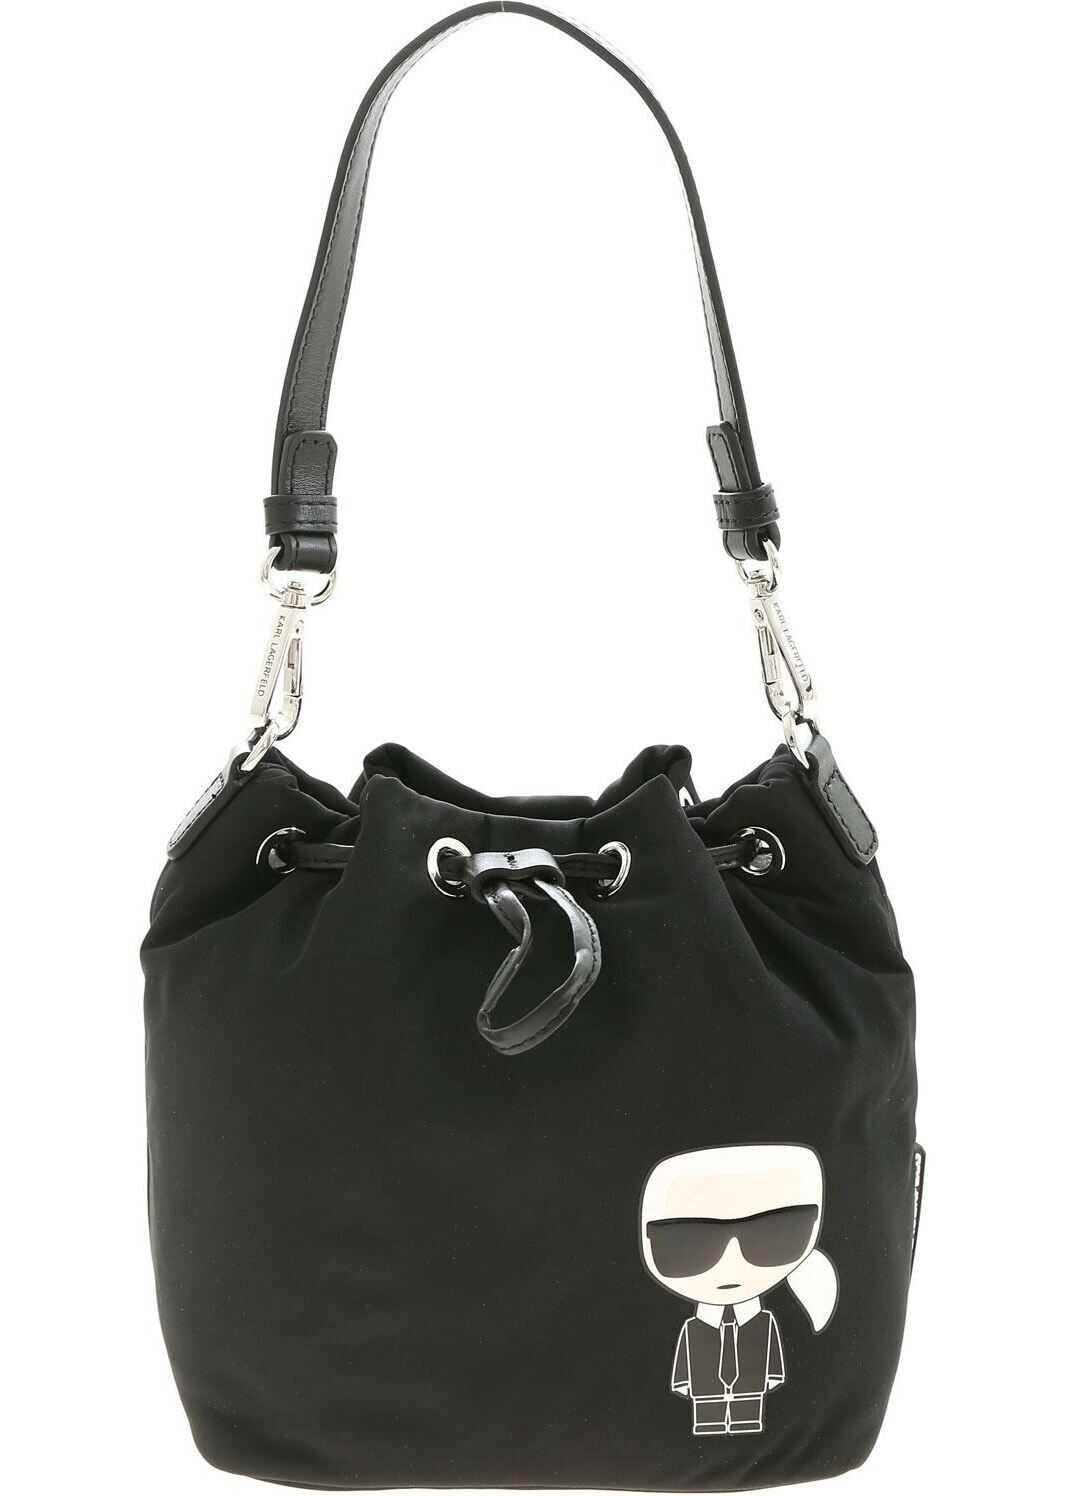 Karl Lagerfeld K/Ikonik Bucket Bag In Black 205W3017 999 Black imagine b-mall.ro